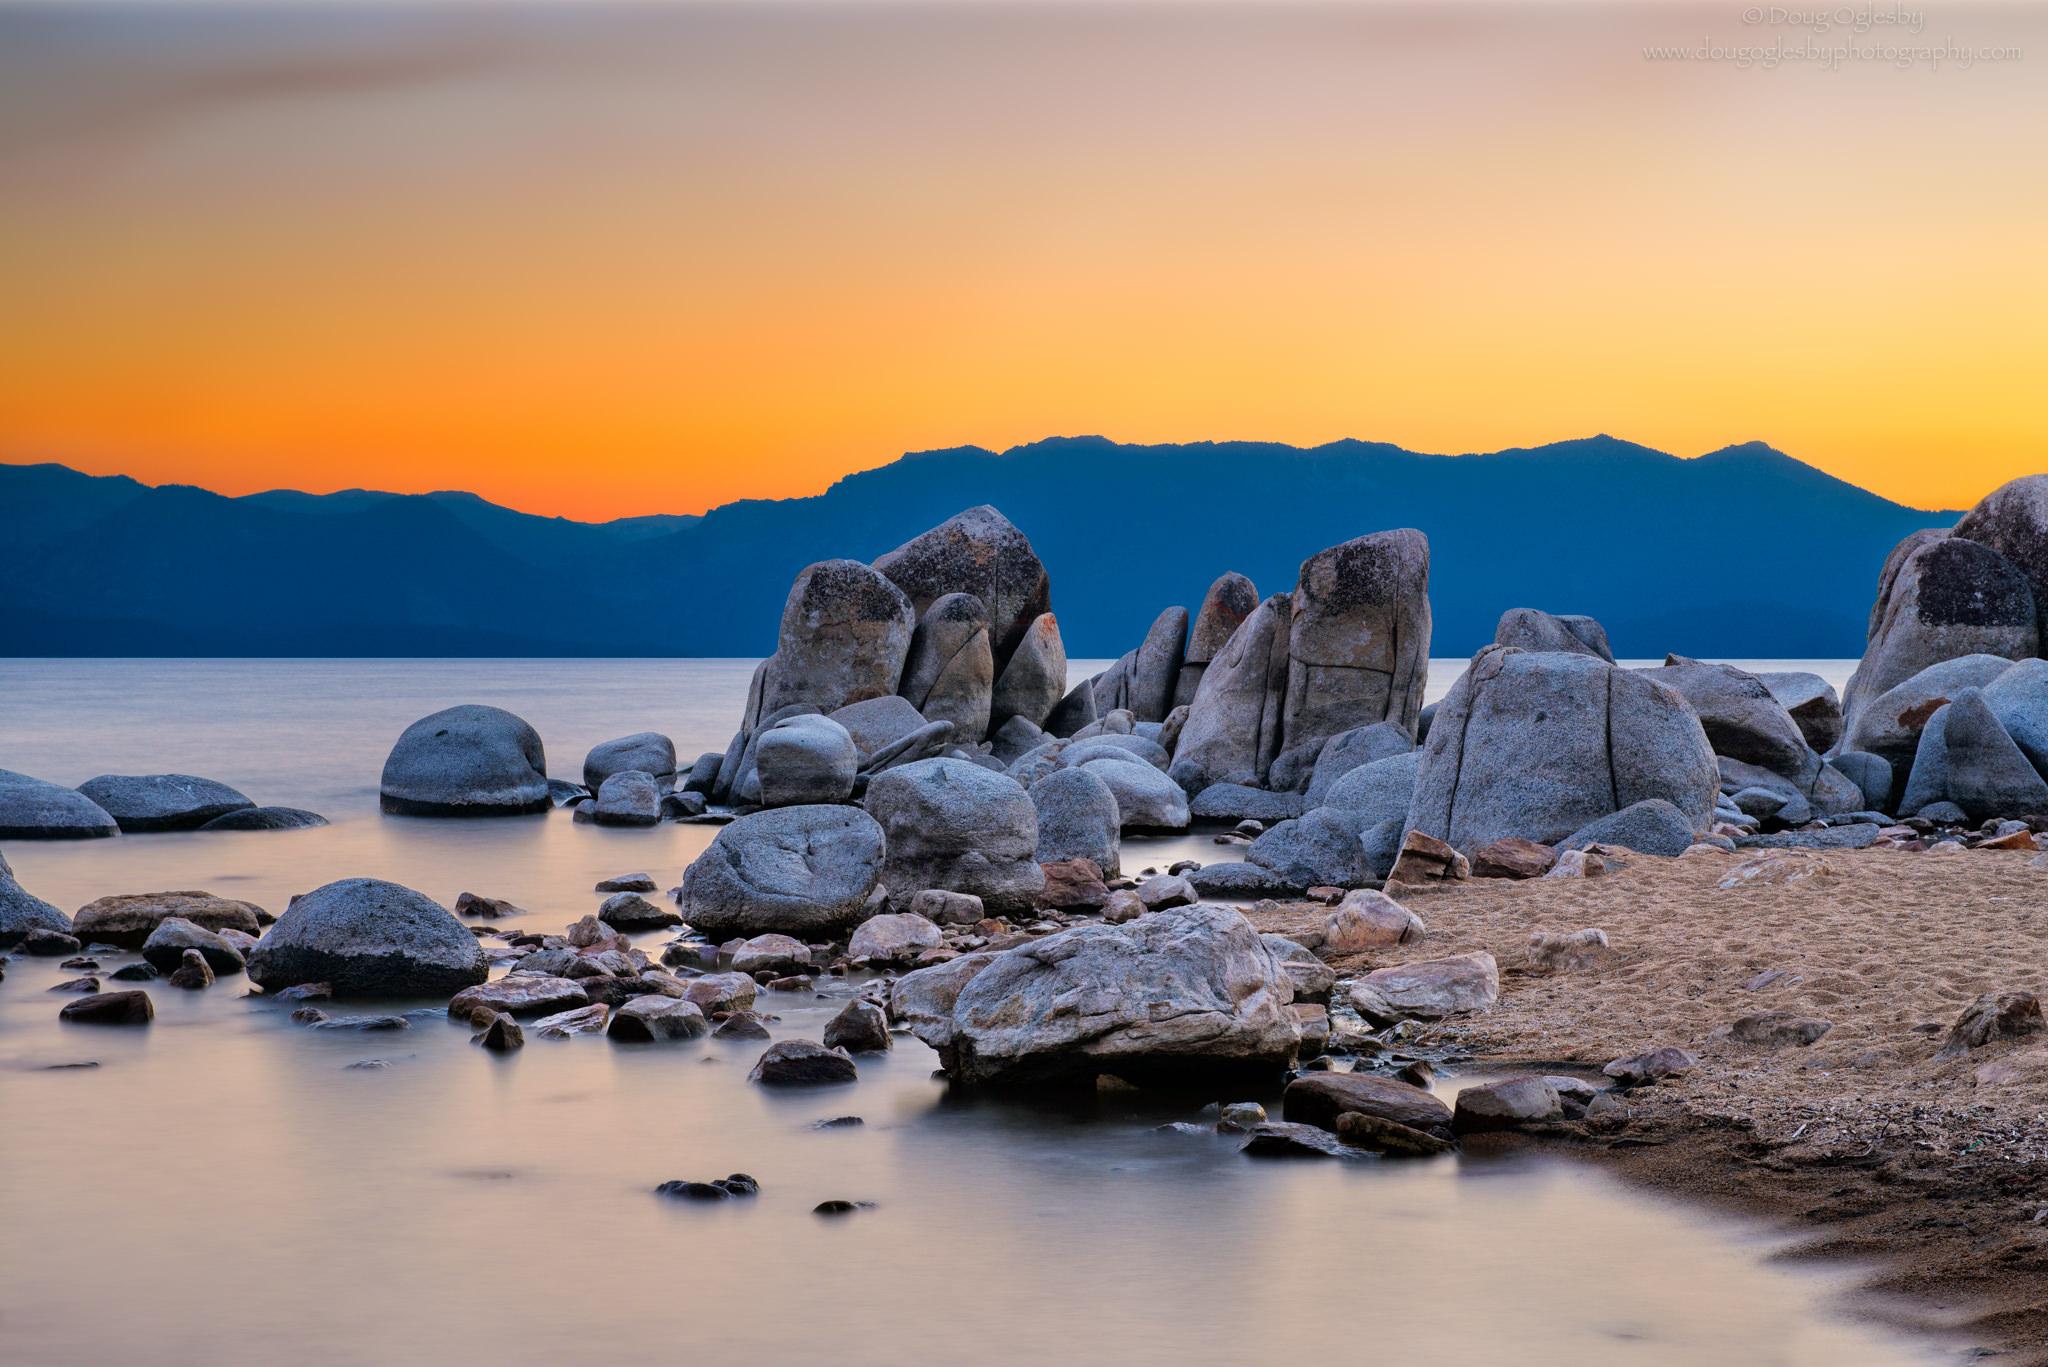 © Zephyr Cove, Lake Tahoe. Photograph by Doug Oglesby. photo@dougoglesby.com. A PHOTOGRAPHY WORLD Article, Beautiful Lake Tahoe @ photographyworld.org